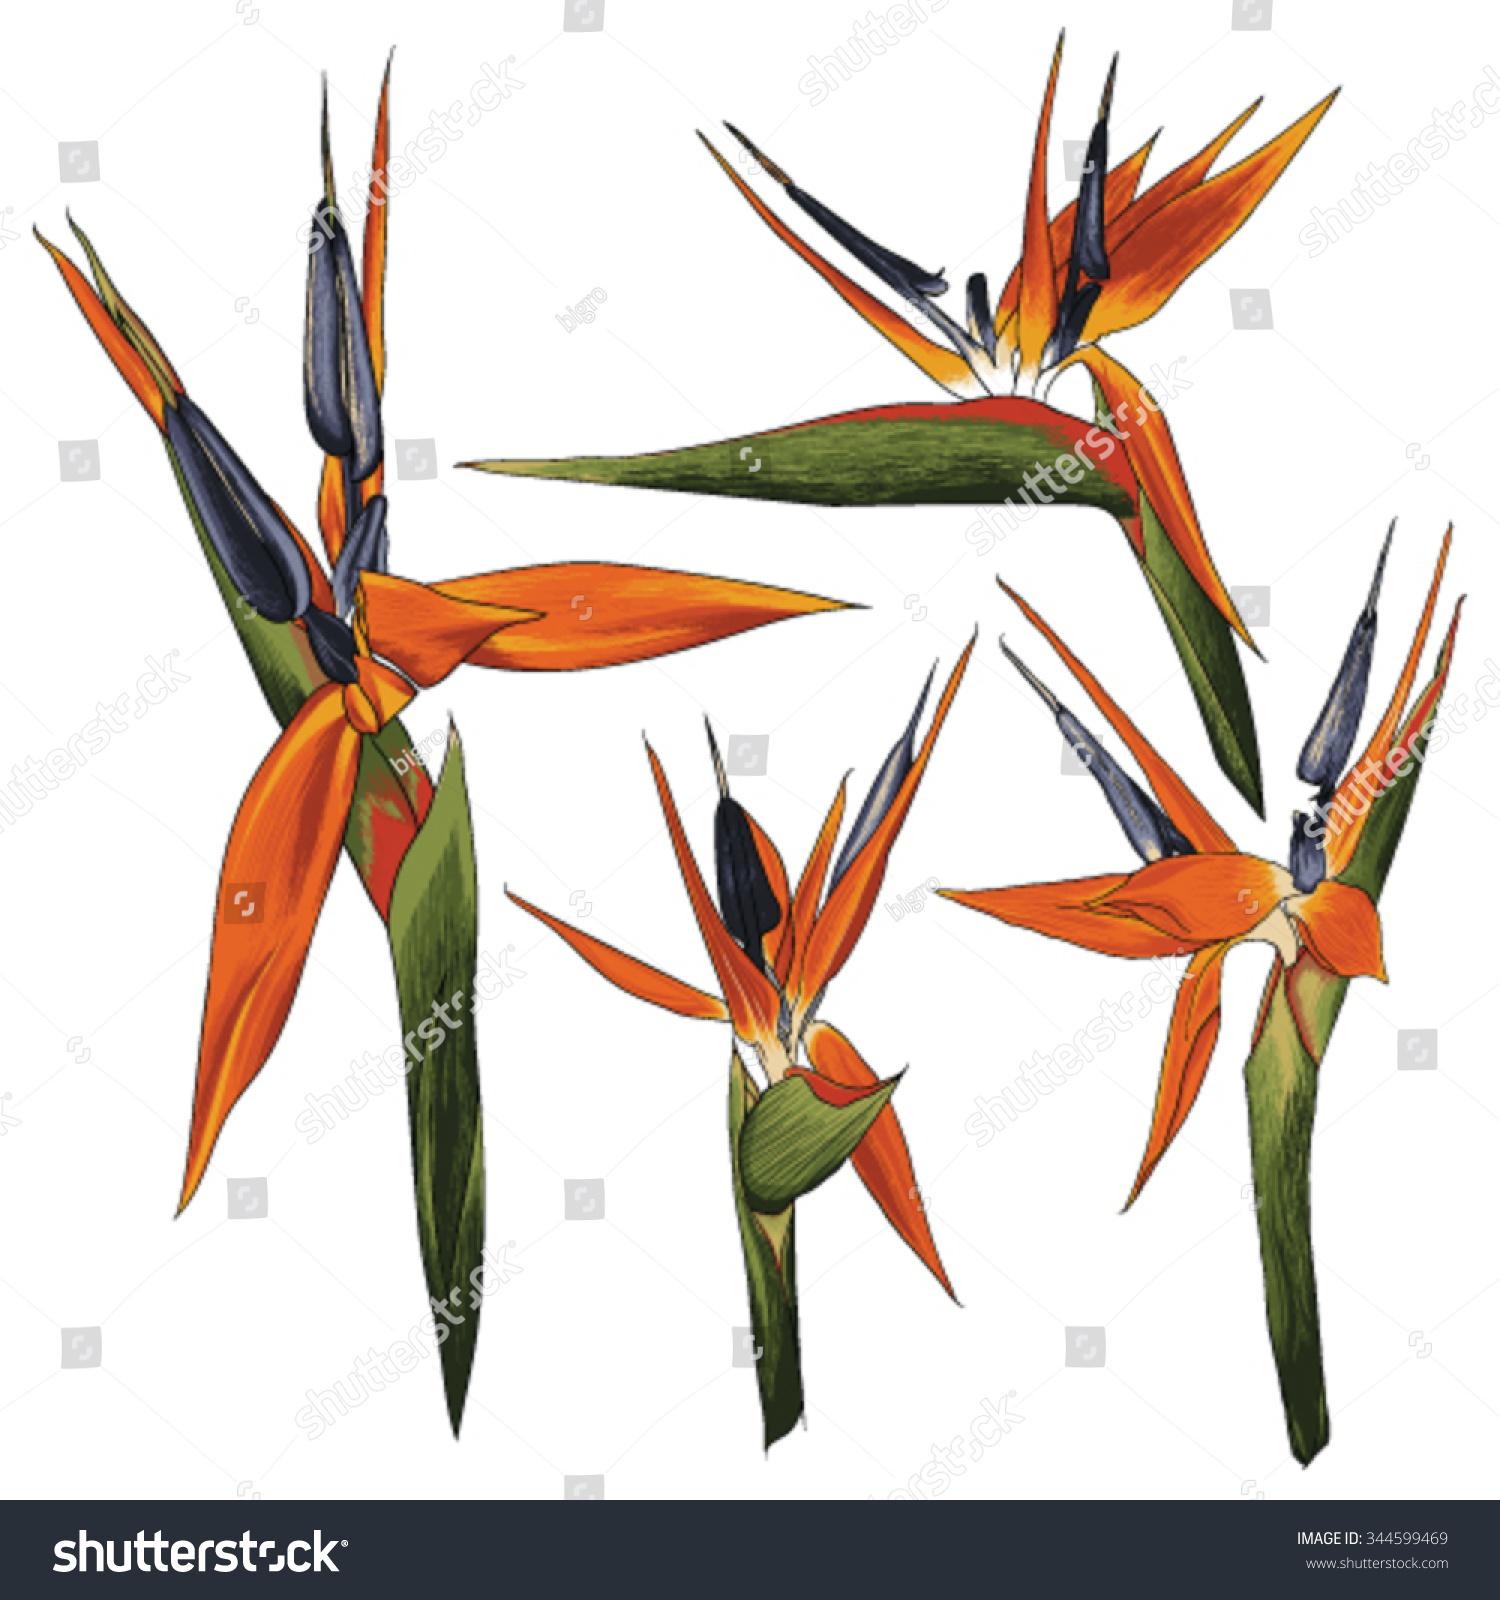 Batch bird paradise flower vector drawings stock vector 344599469 batch of bird of paradise flower vector drawings strelitzia reginae eps8 buycottarizona